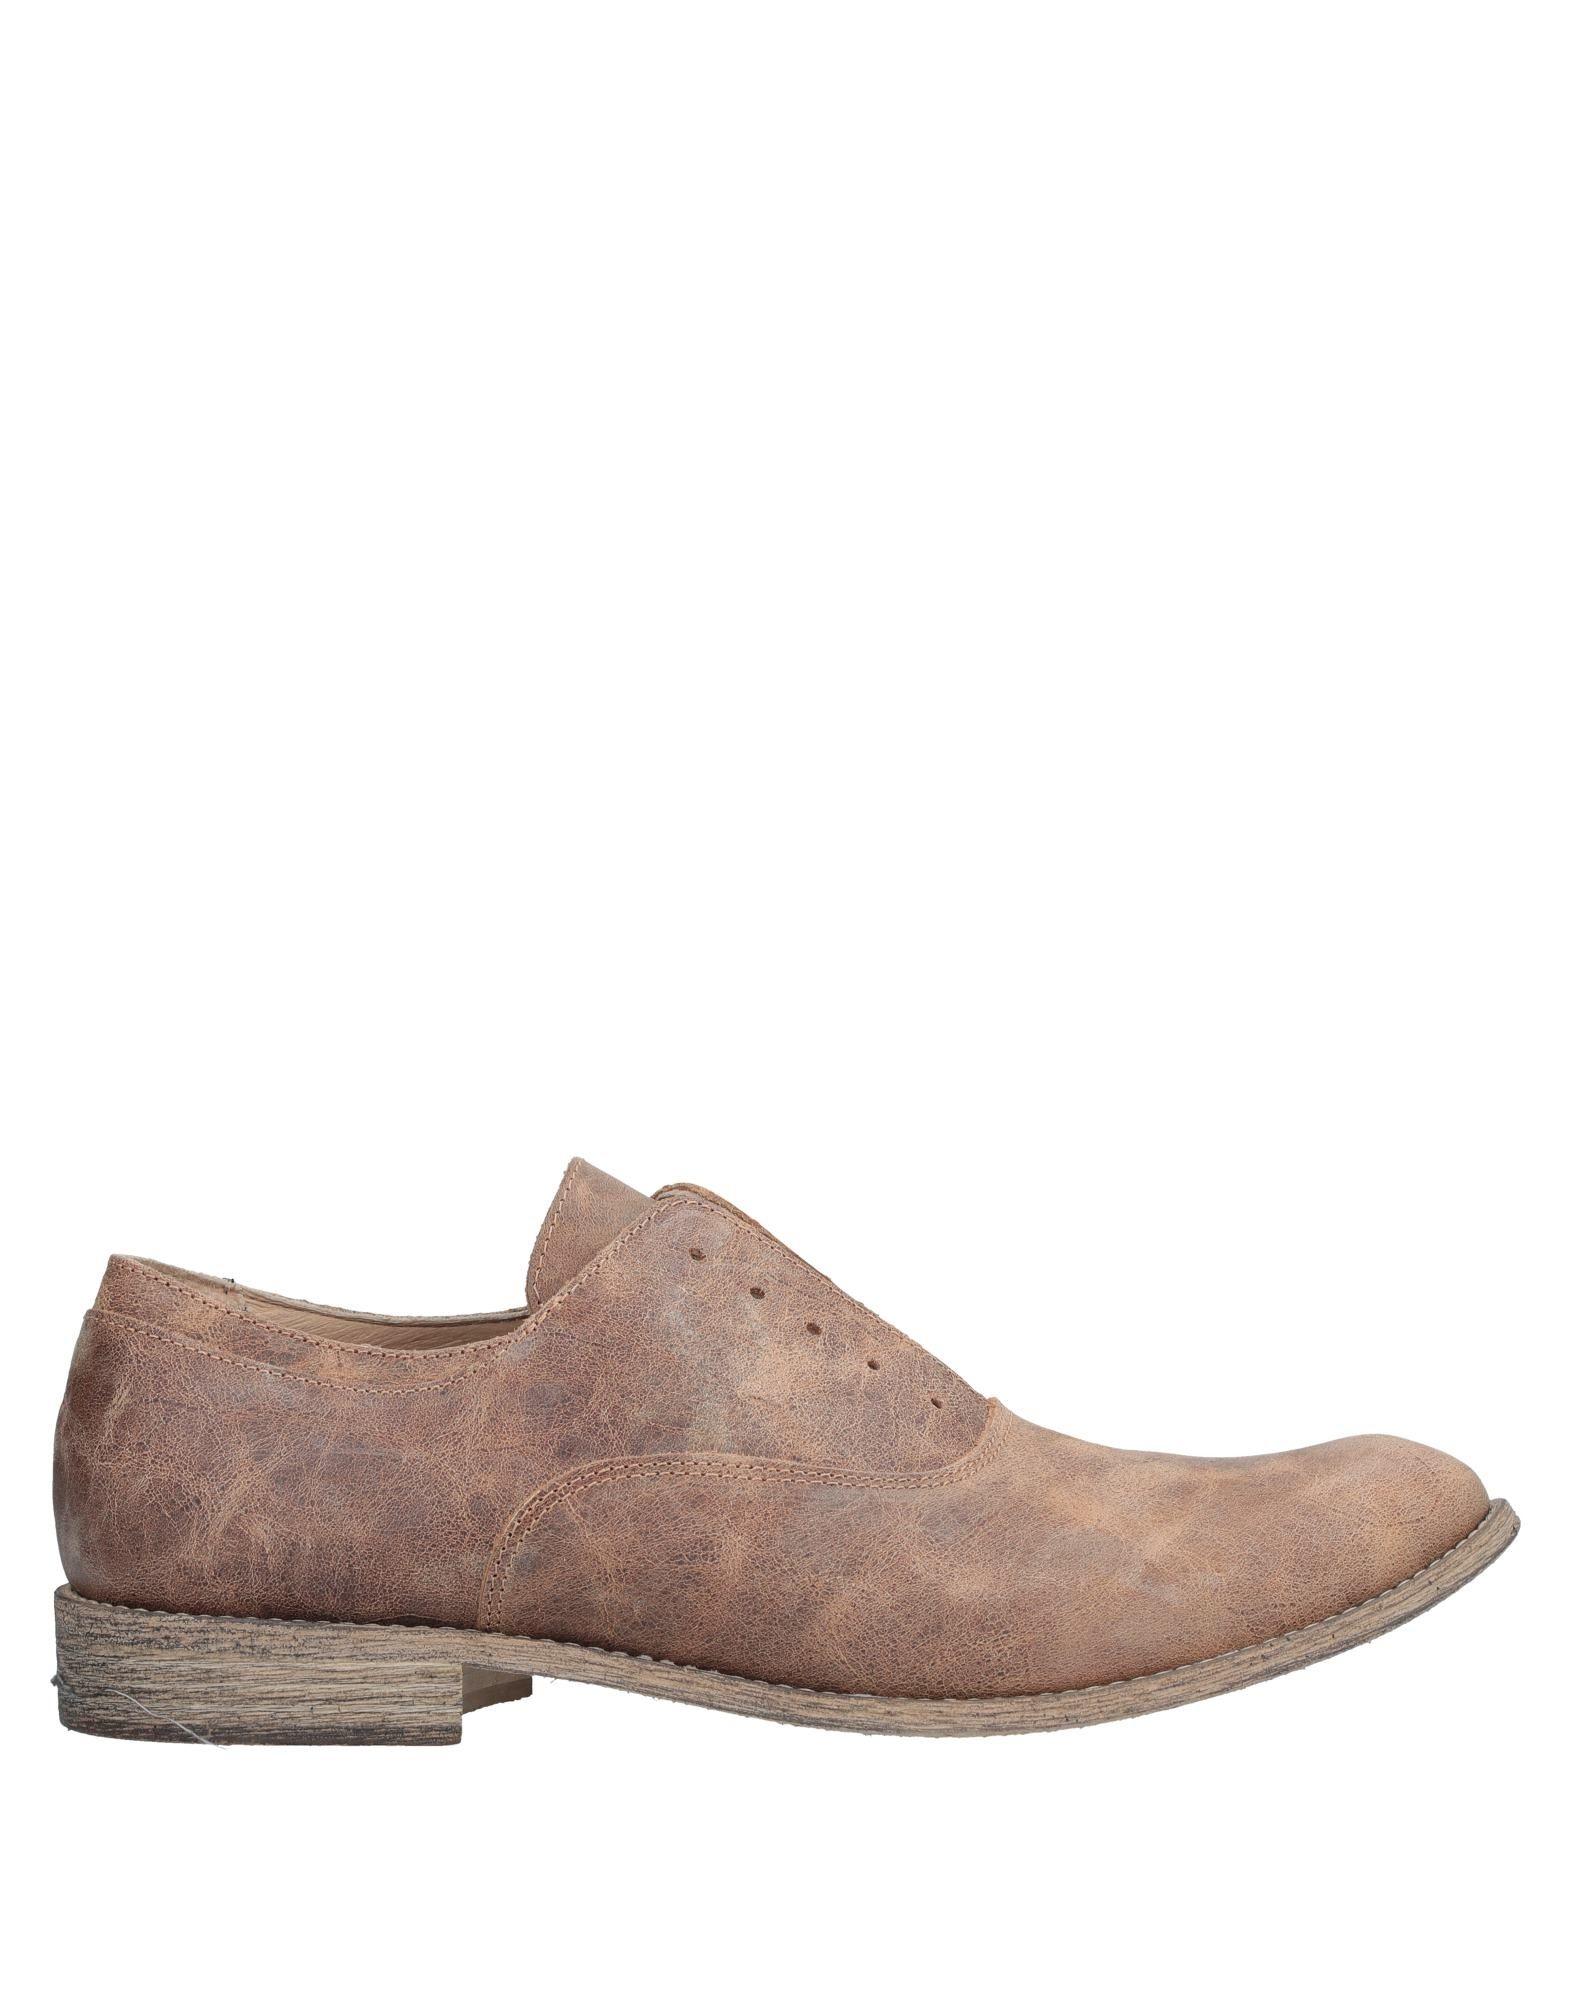 Rabatt echte Schuhe Officina 11540368EB 36 Mokassins Herren  11540368EB Officina 5155f1